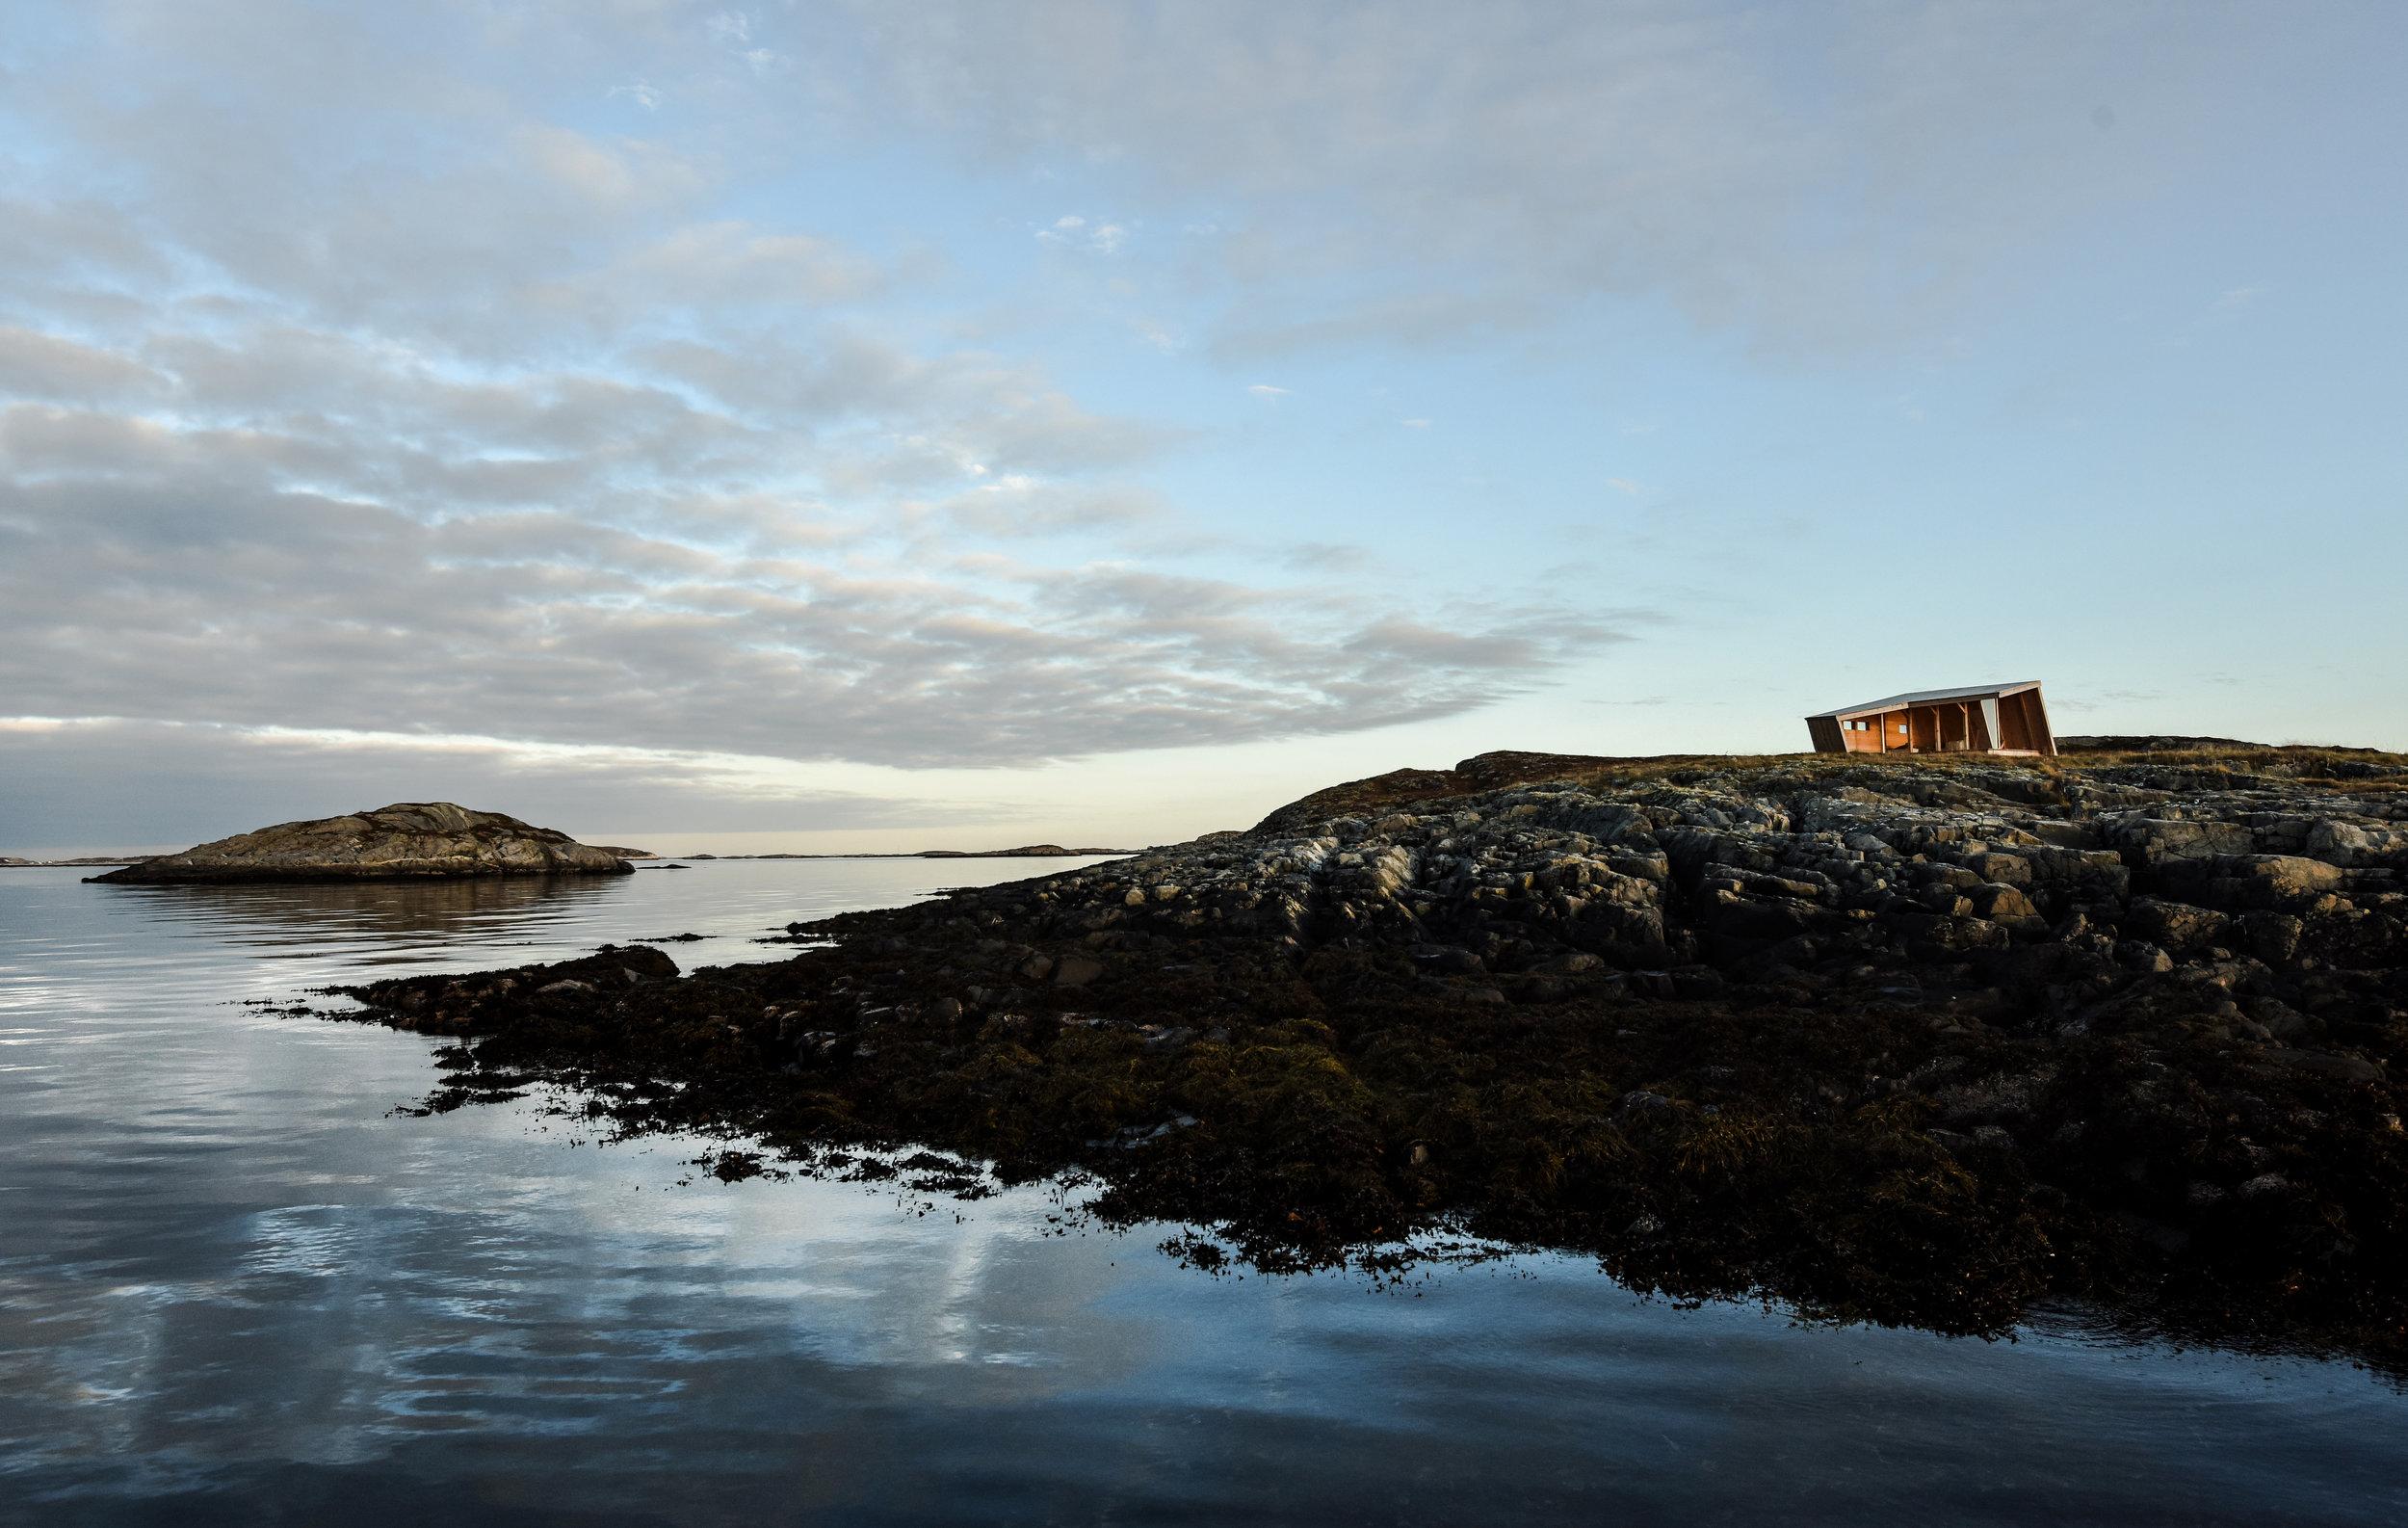 Smøla wind shelter Svanøya Nov 2014 from boat © Amundsen Biotope.JPG